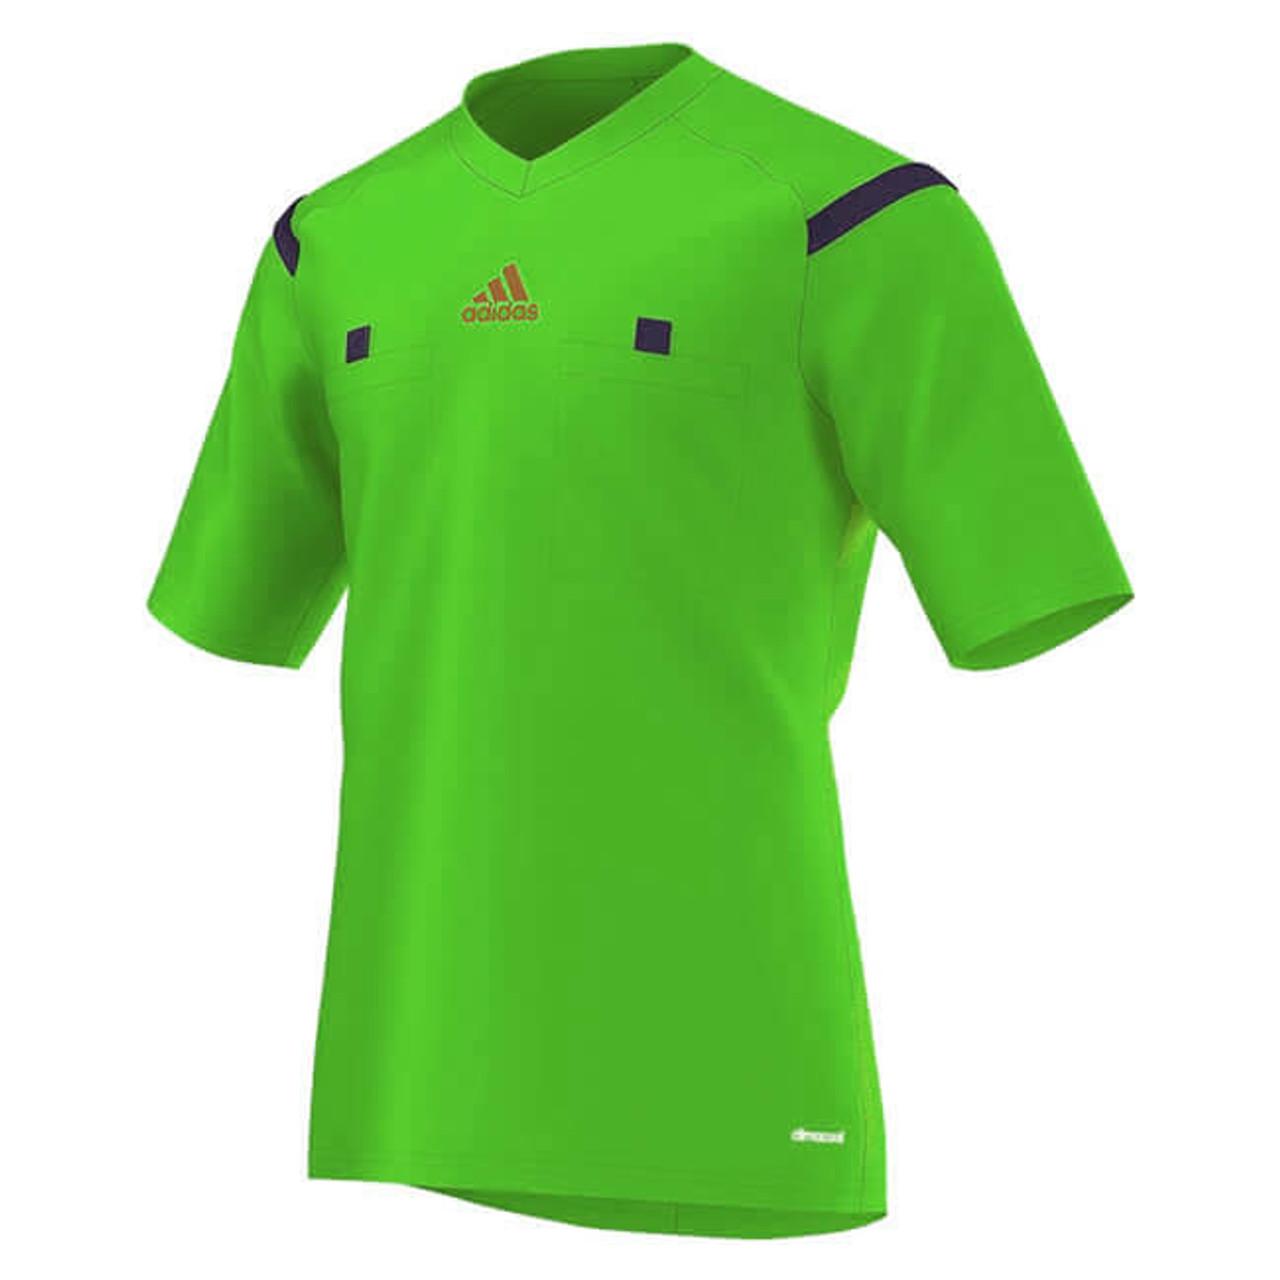 online store 683dd cb21c 2014 Adidas Referee Jersey Short Sleeve (Green)